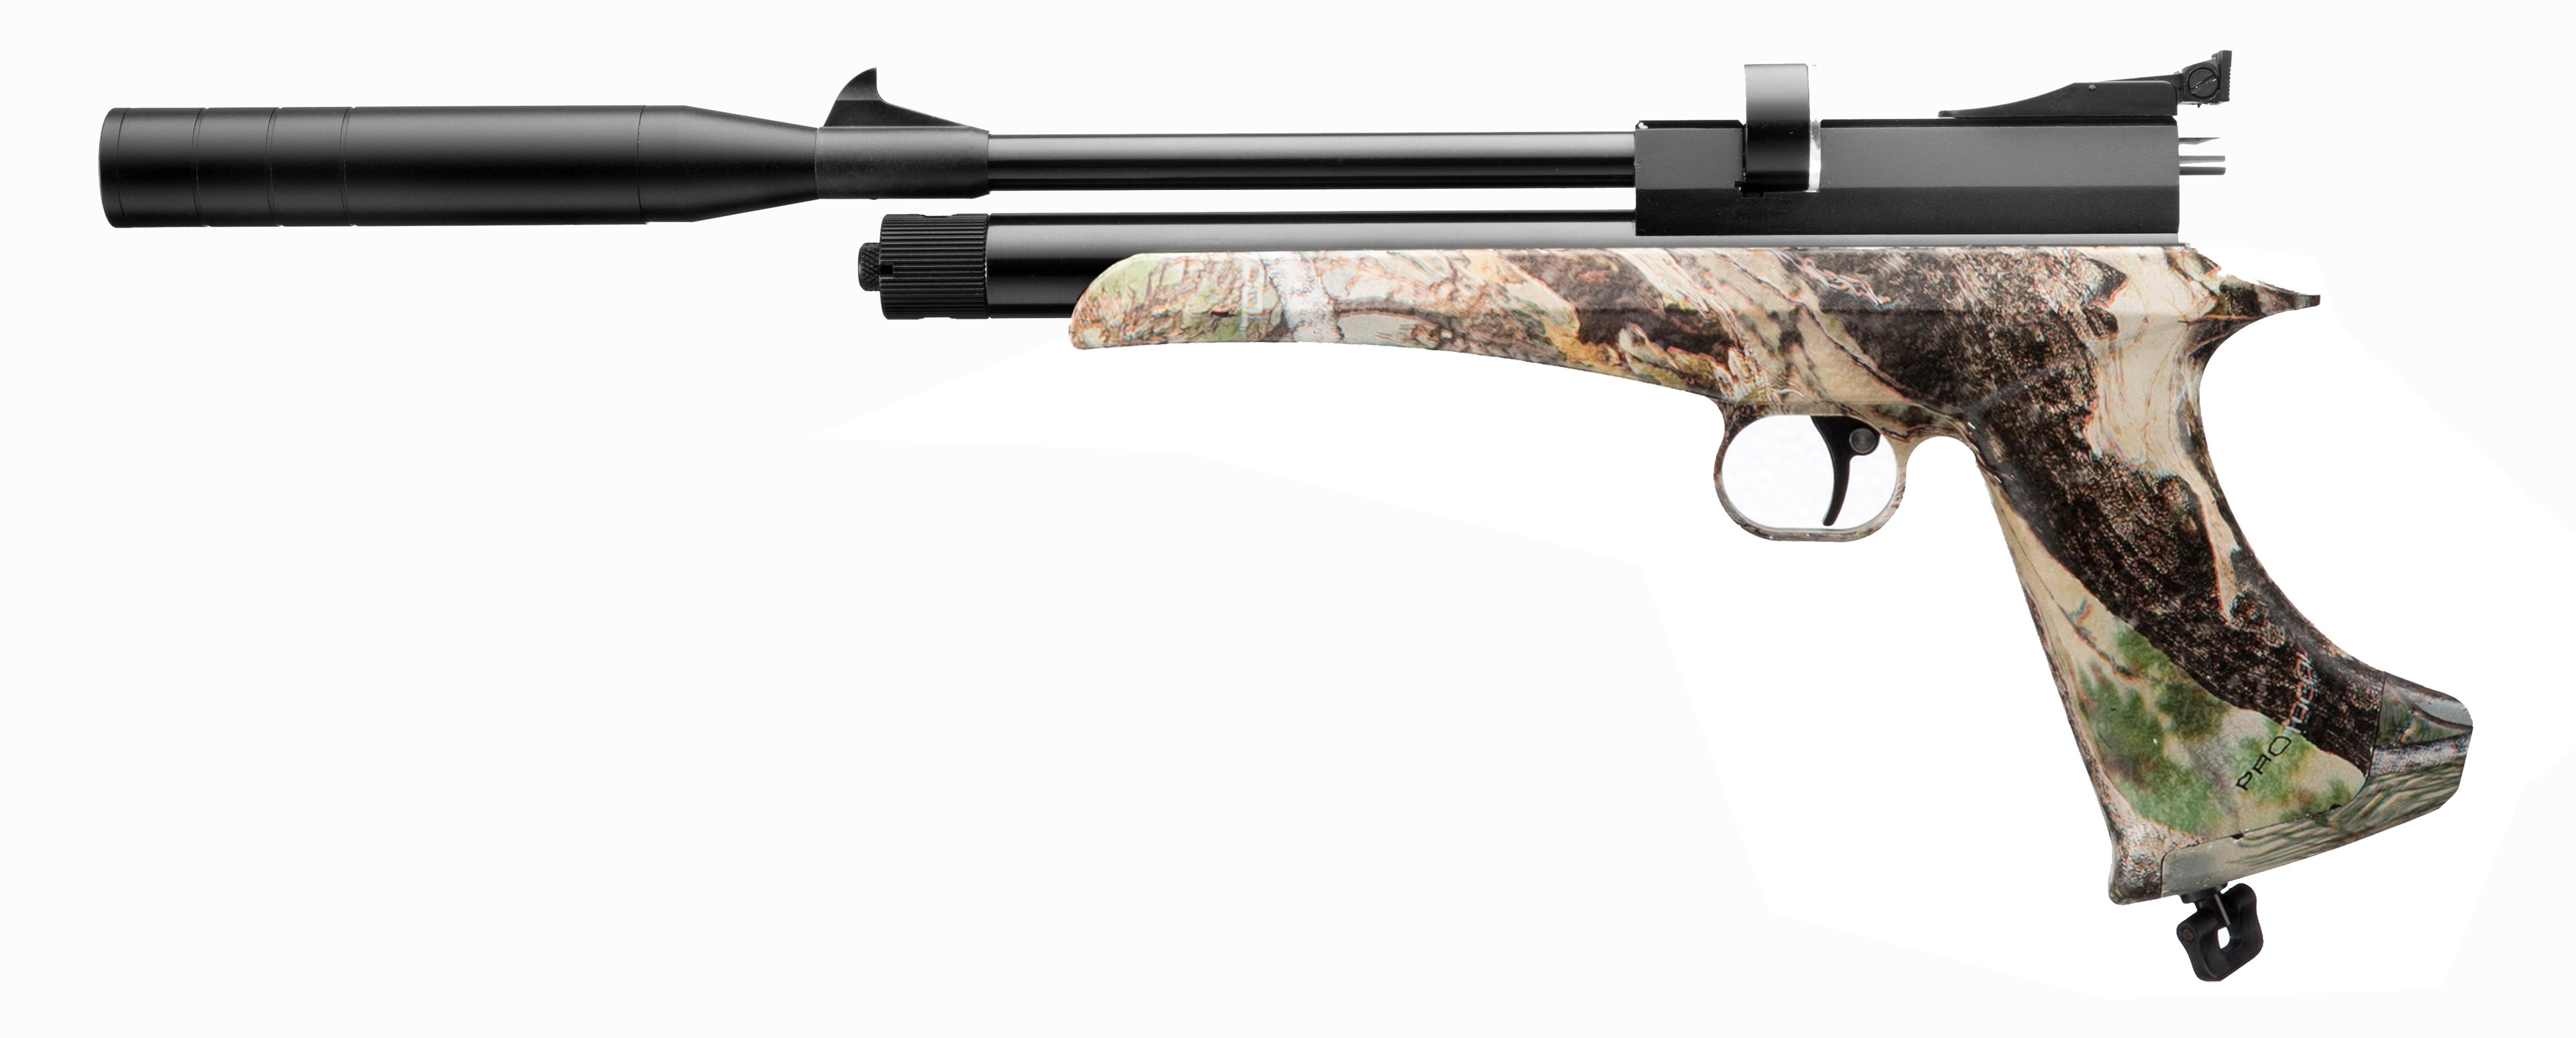 Sportsmarketing™ SMK™ announces the new Victory™ CP2 pistol